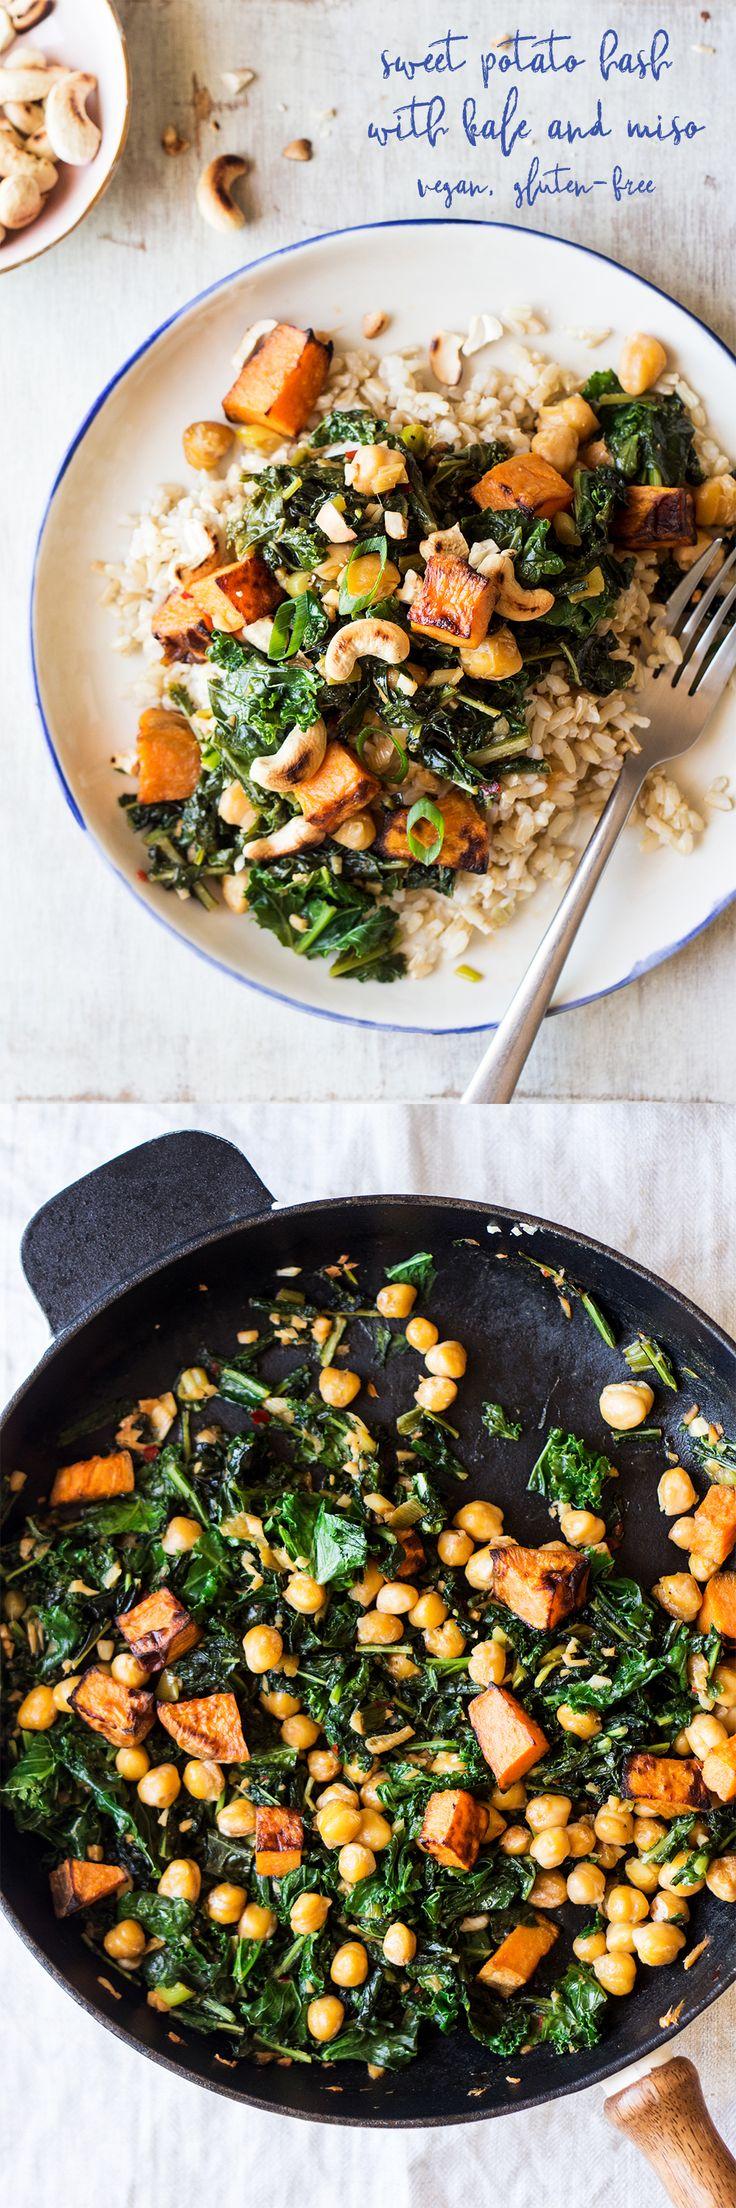 #dinner #vegan #vegetarian #healthy #miso #glutenfree #sweetpotato #kale #lunch